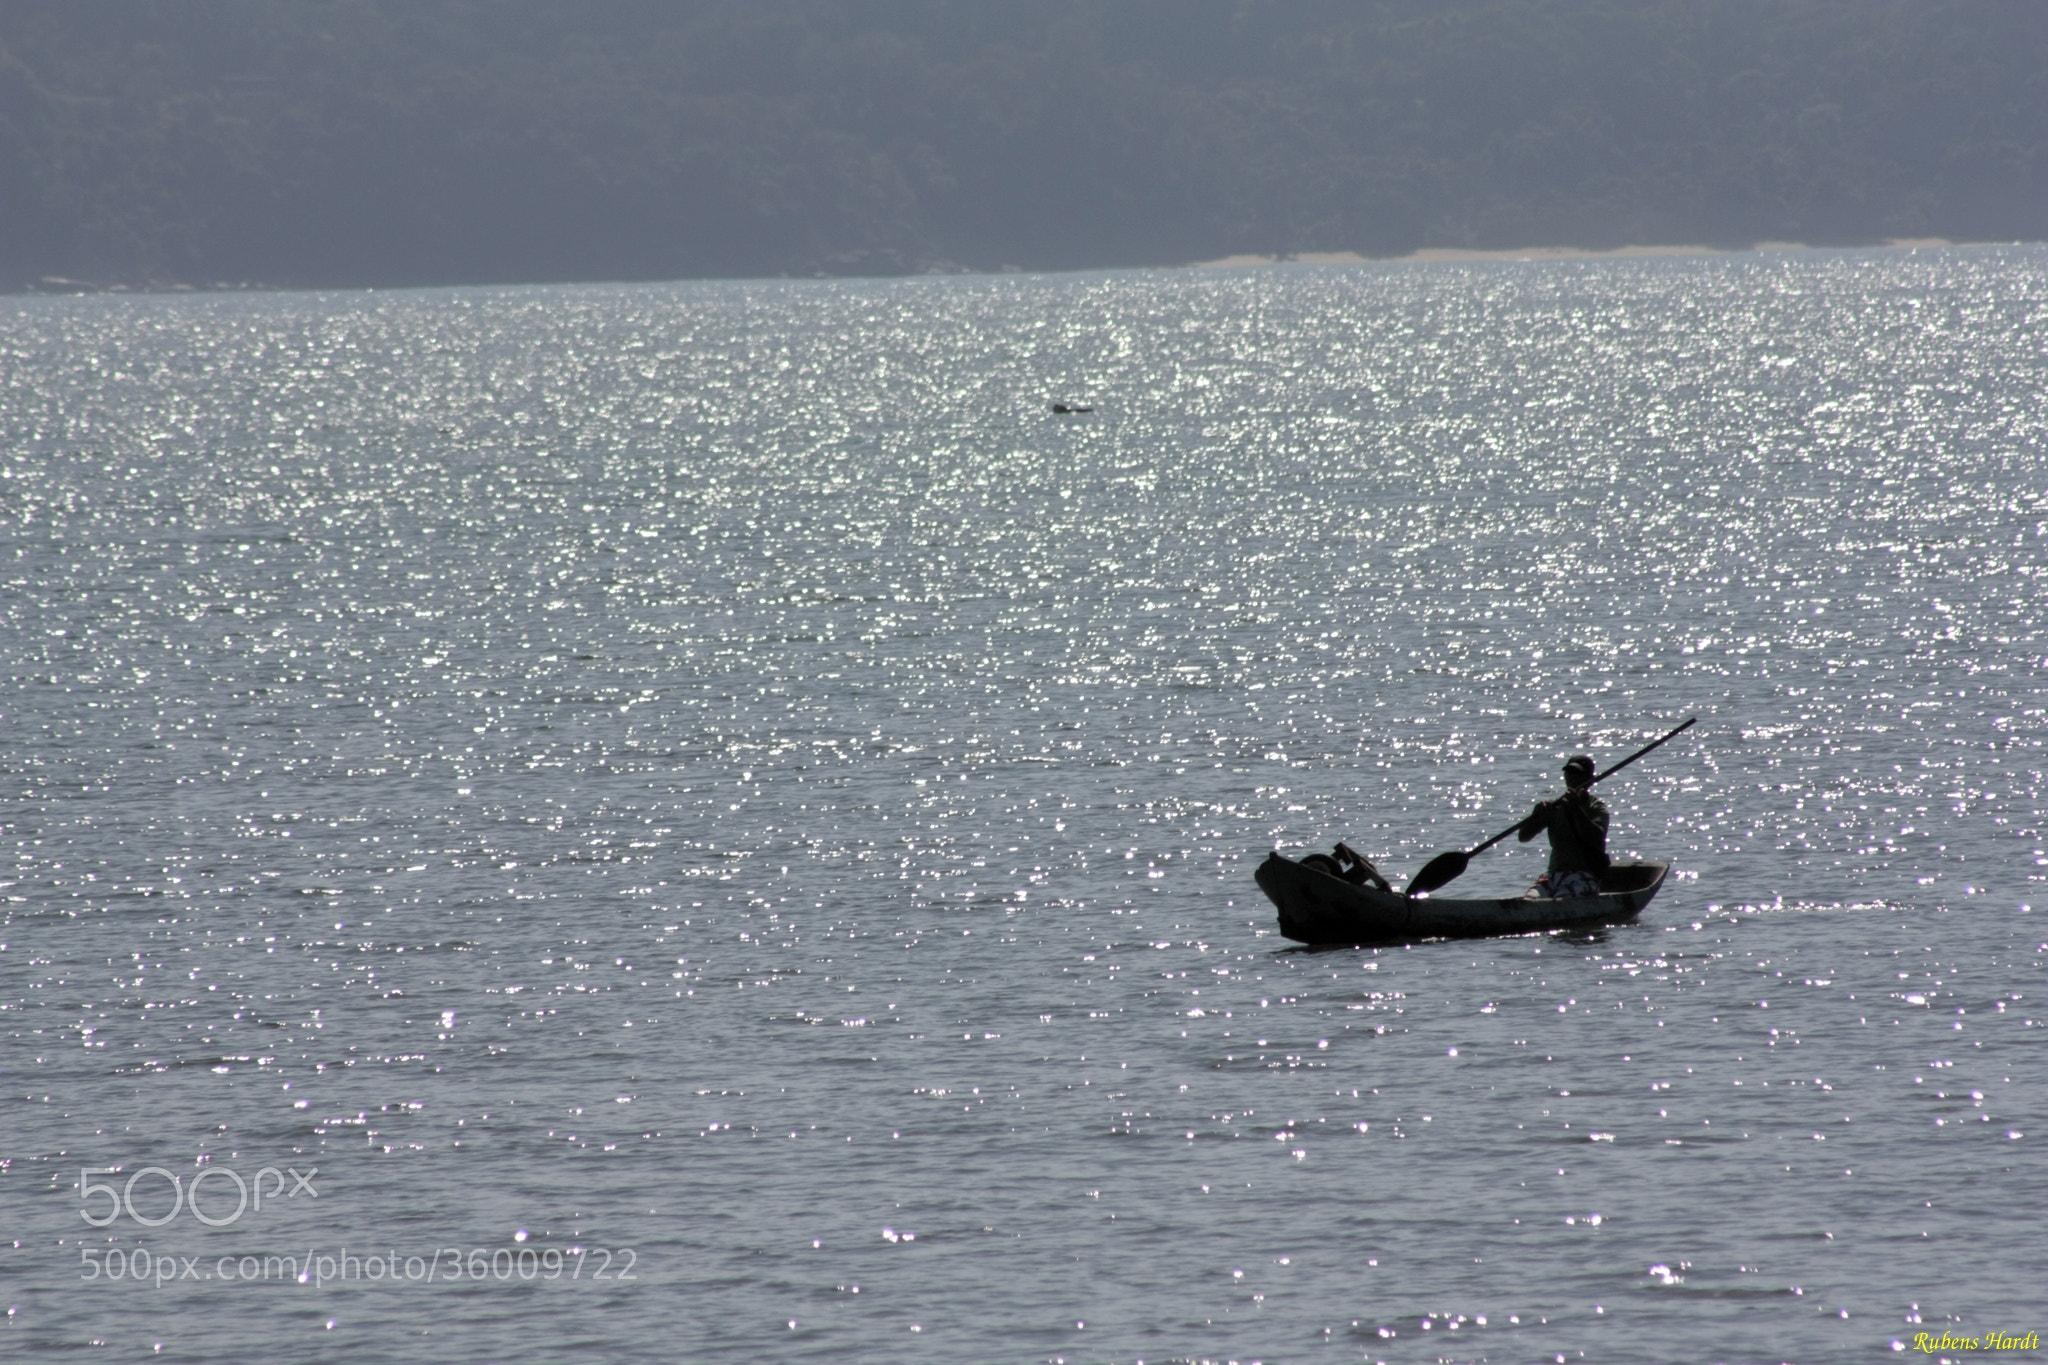 Photograph Boatman by Rubens Hardt on 500px